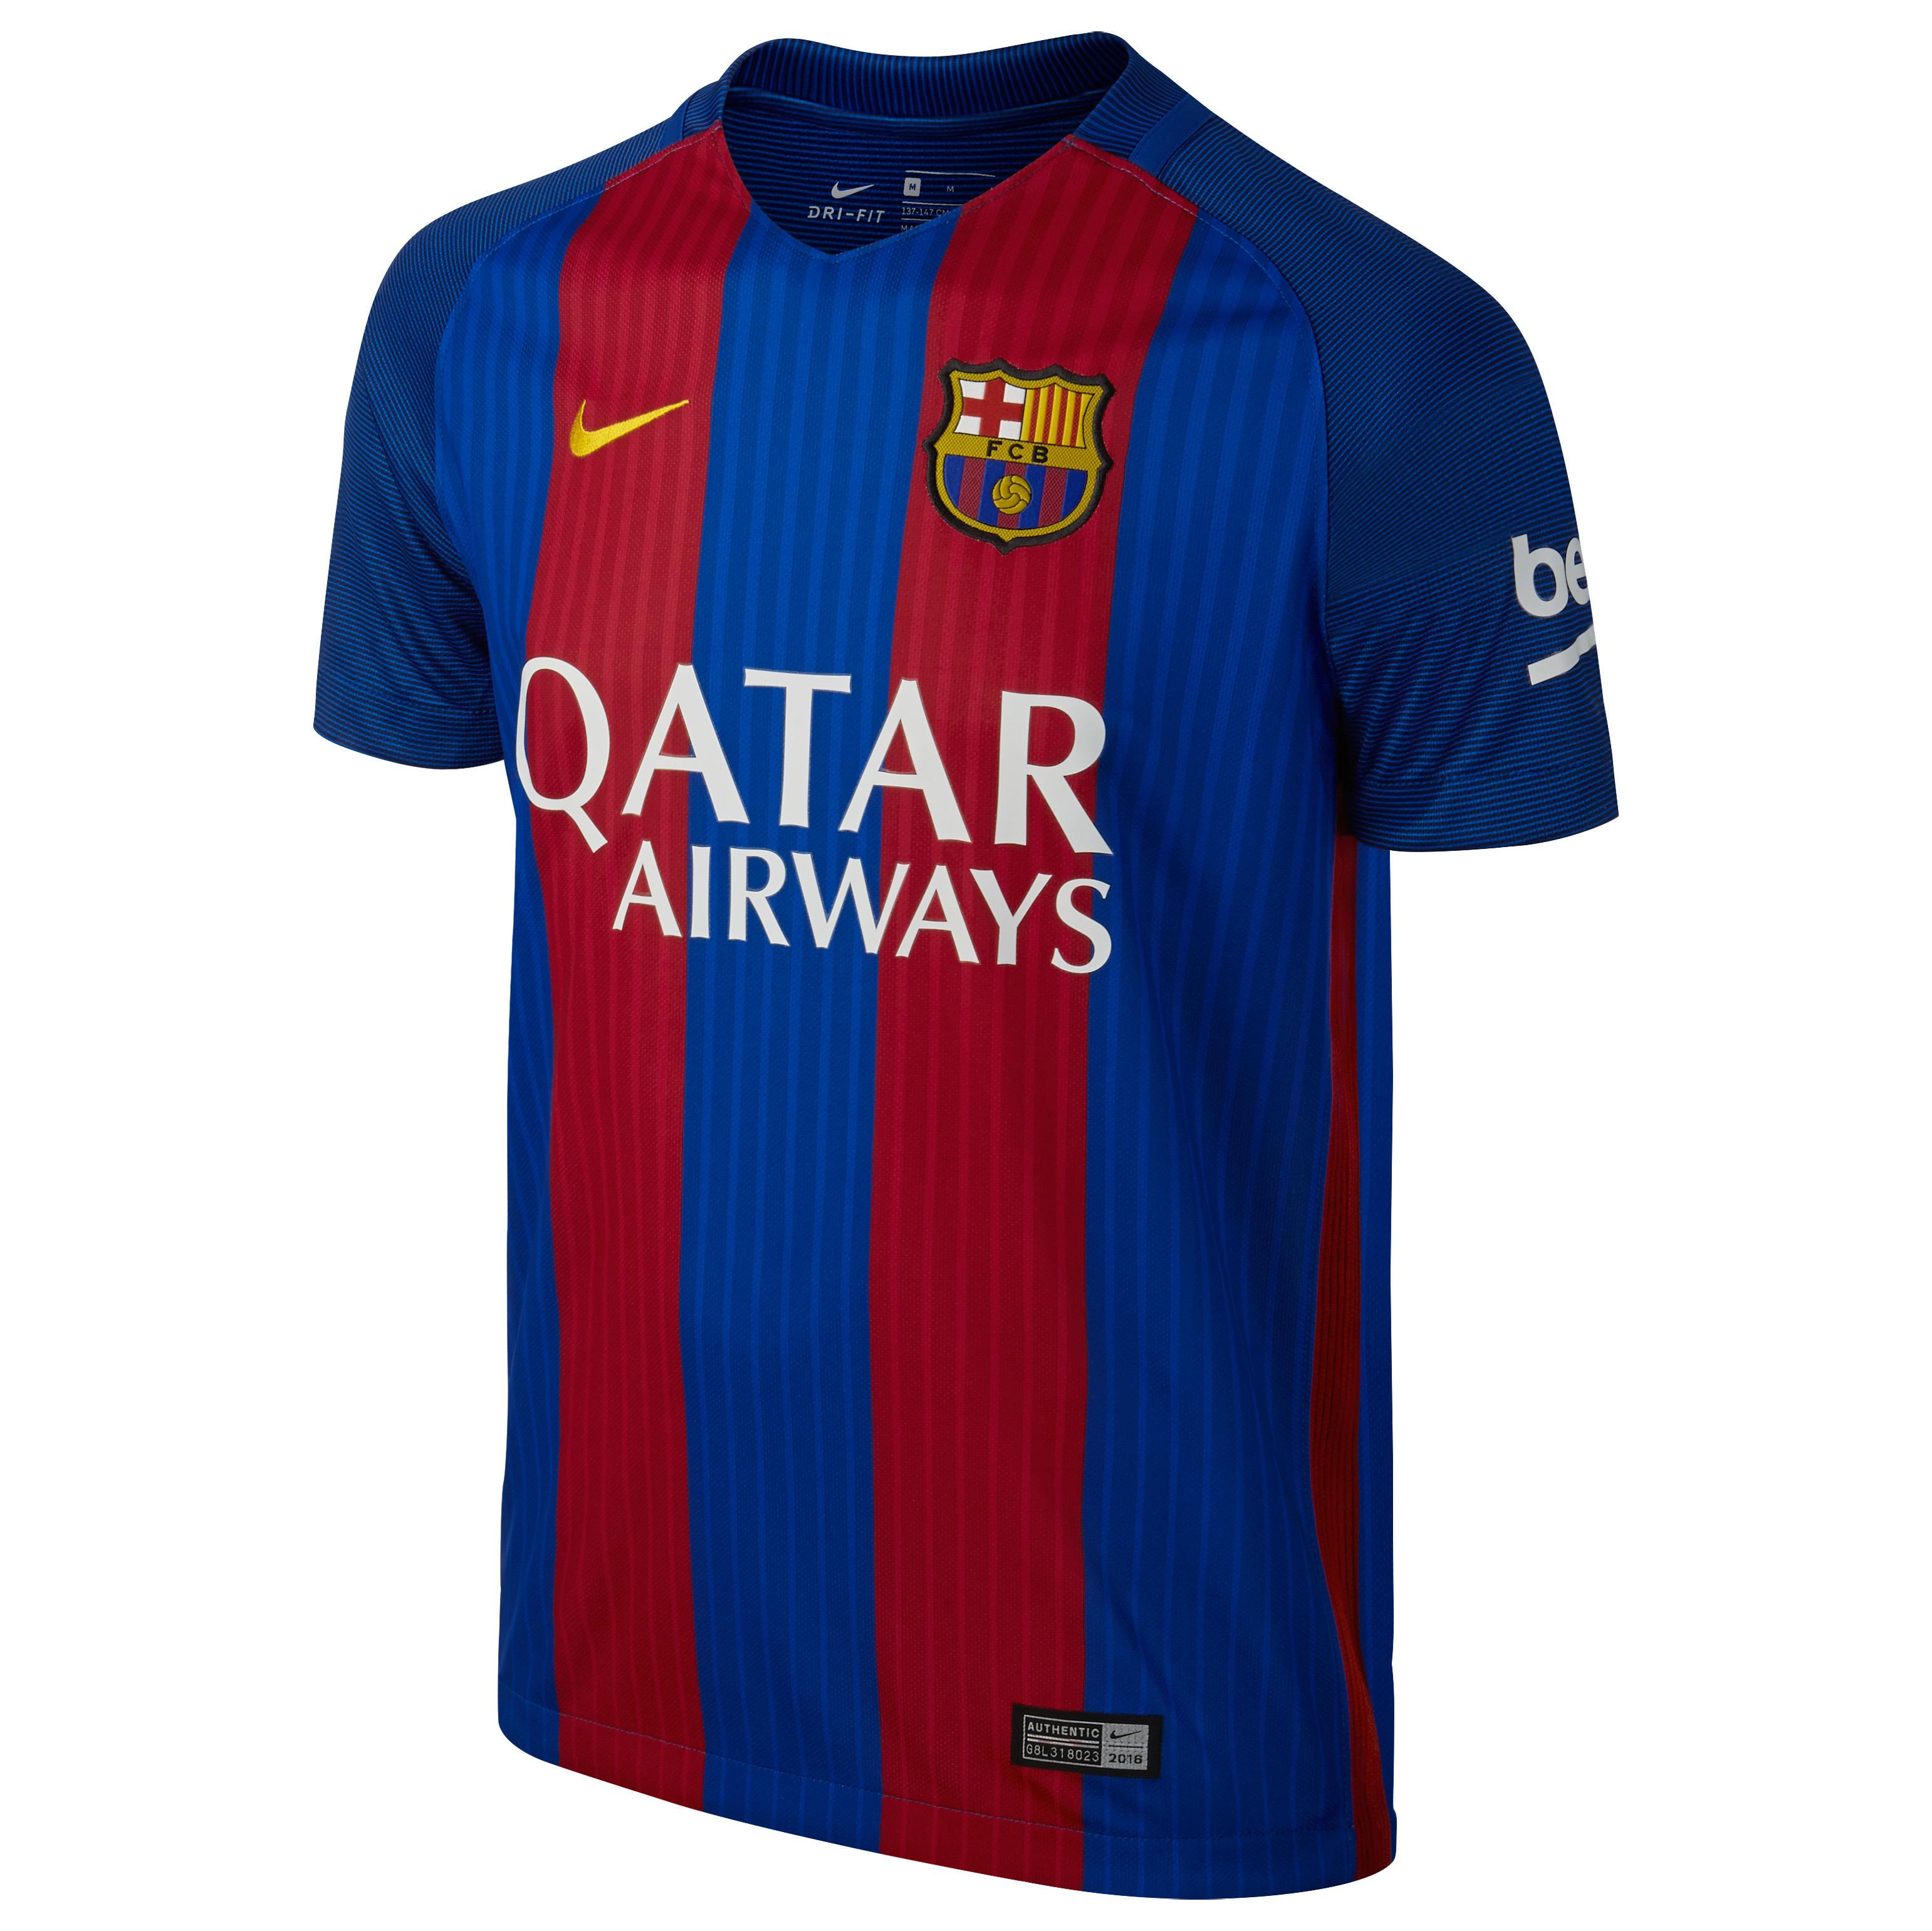 Nike Voetbalshirt Barcelona thuisshirt volwassenen blauw/rood